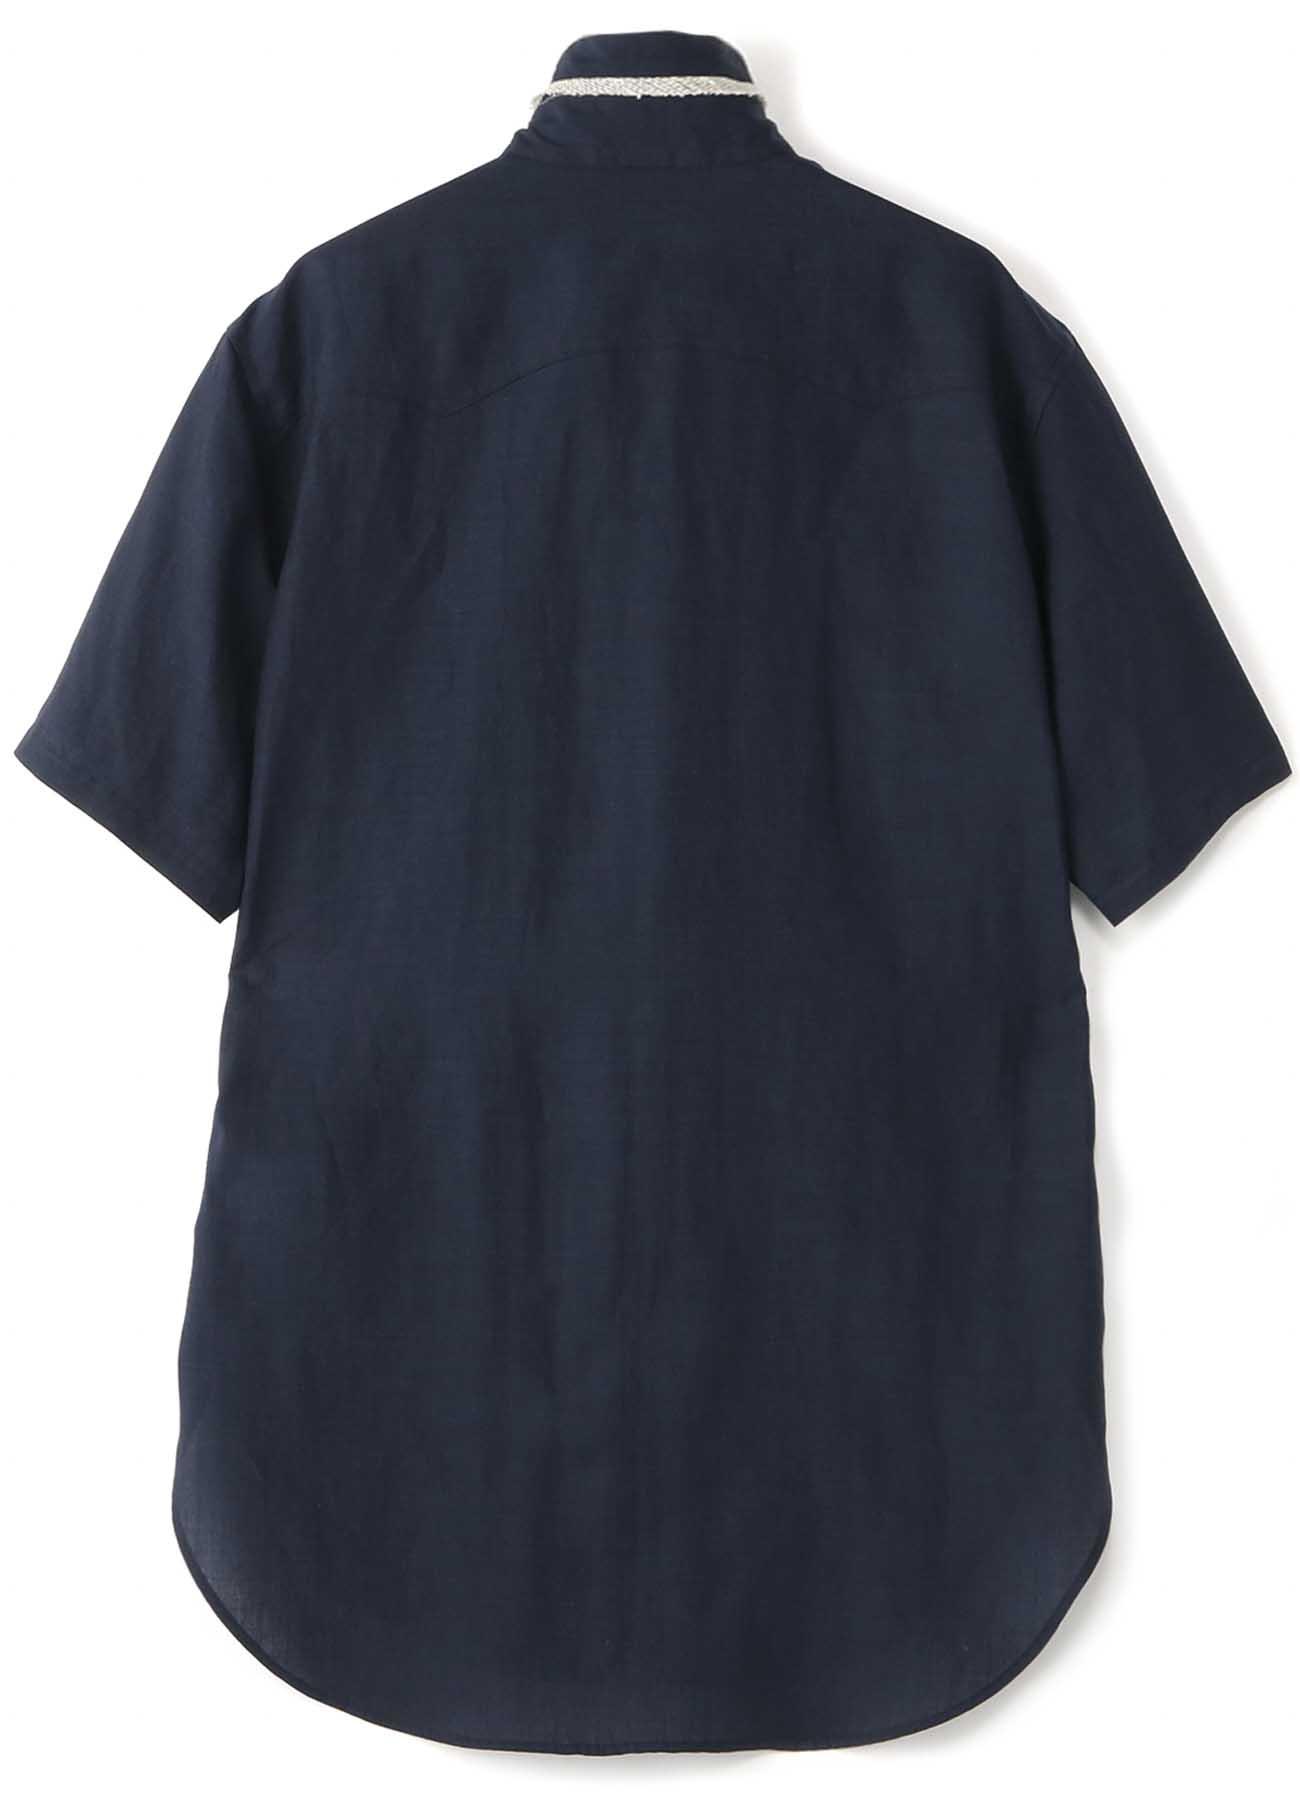 Lyocell ie麻天然草坪短袖军事衬衫